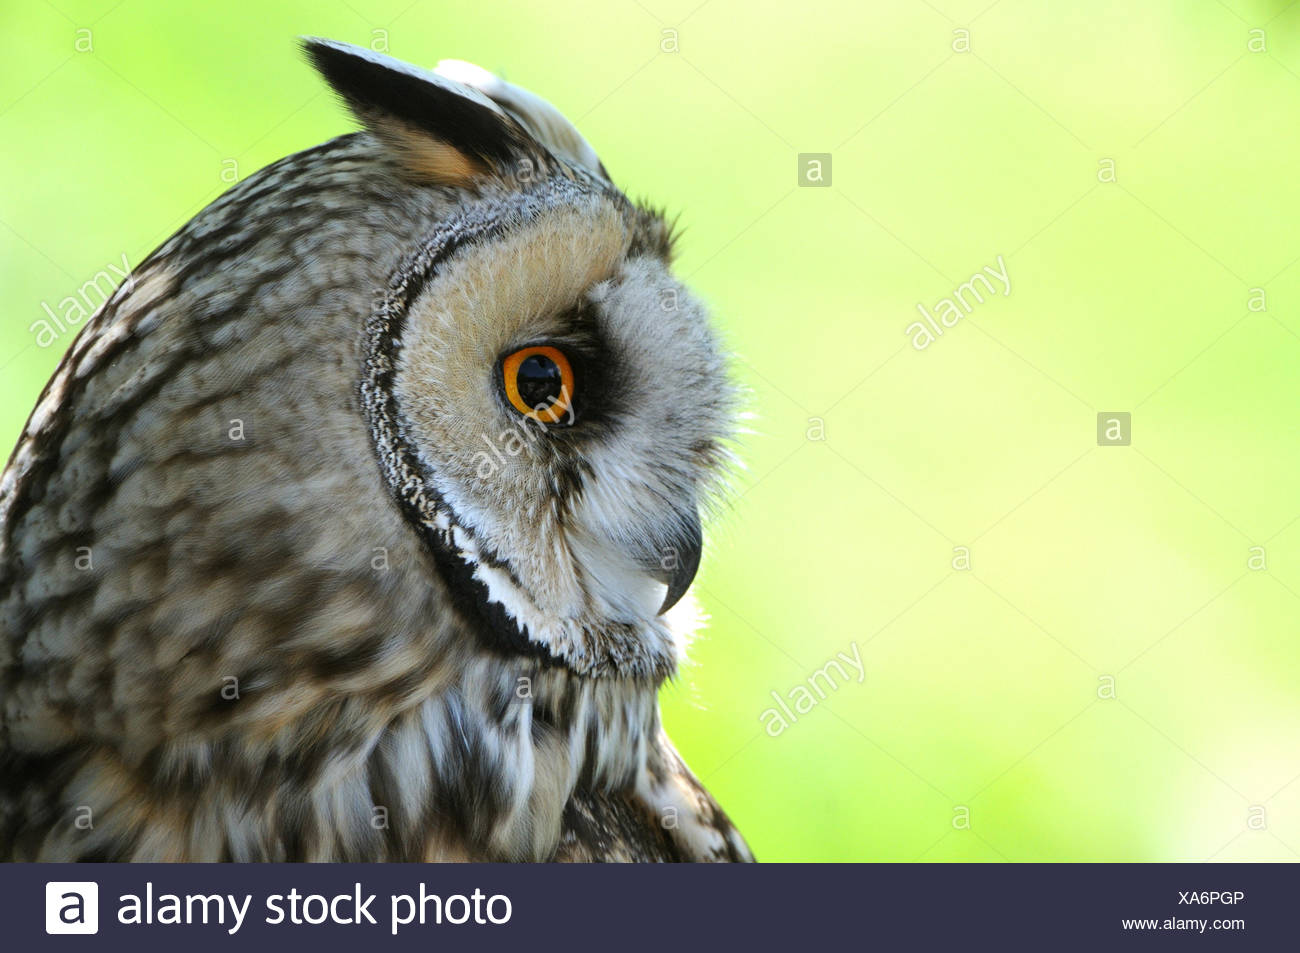 Lange eared Eule, Asio Otus, Eule, Eulen, Nachtschwärmer, Ohr Eulen, Vogel, Tier, Tiere, Deutschland, Europa, Stockbild